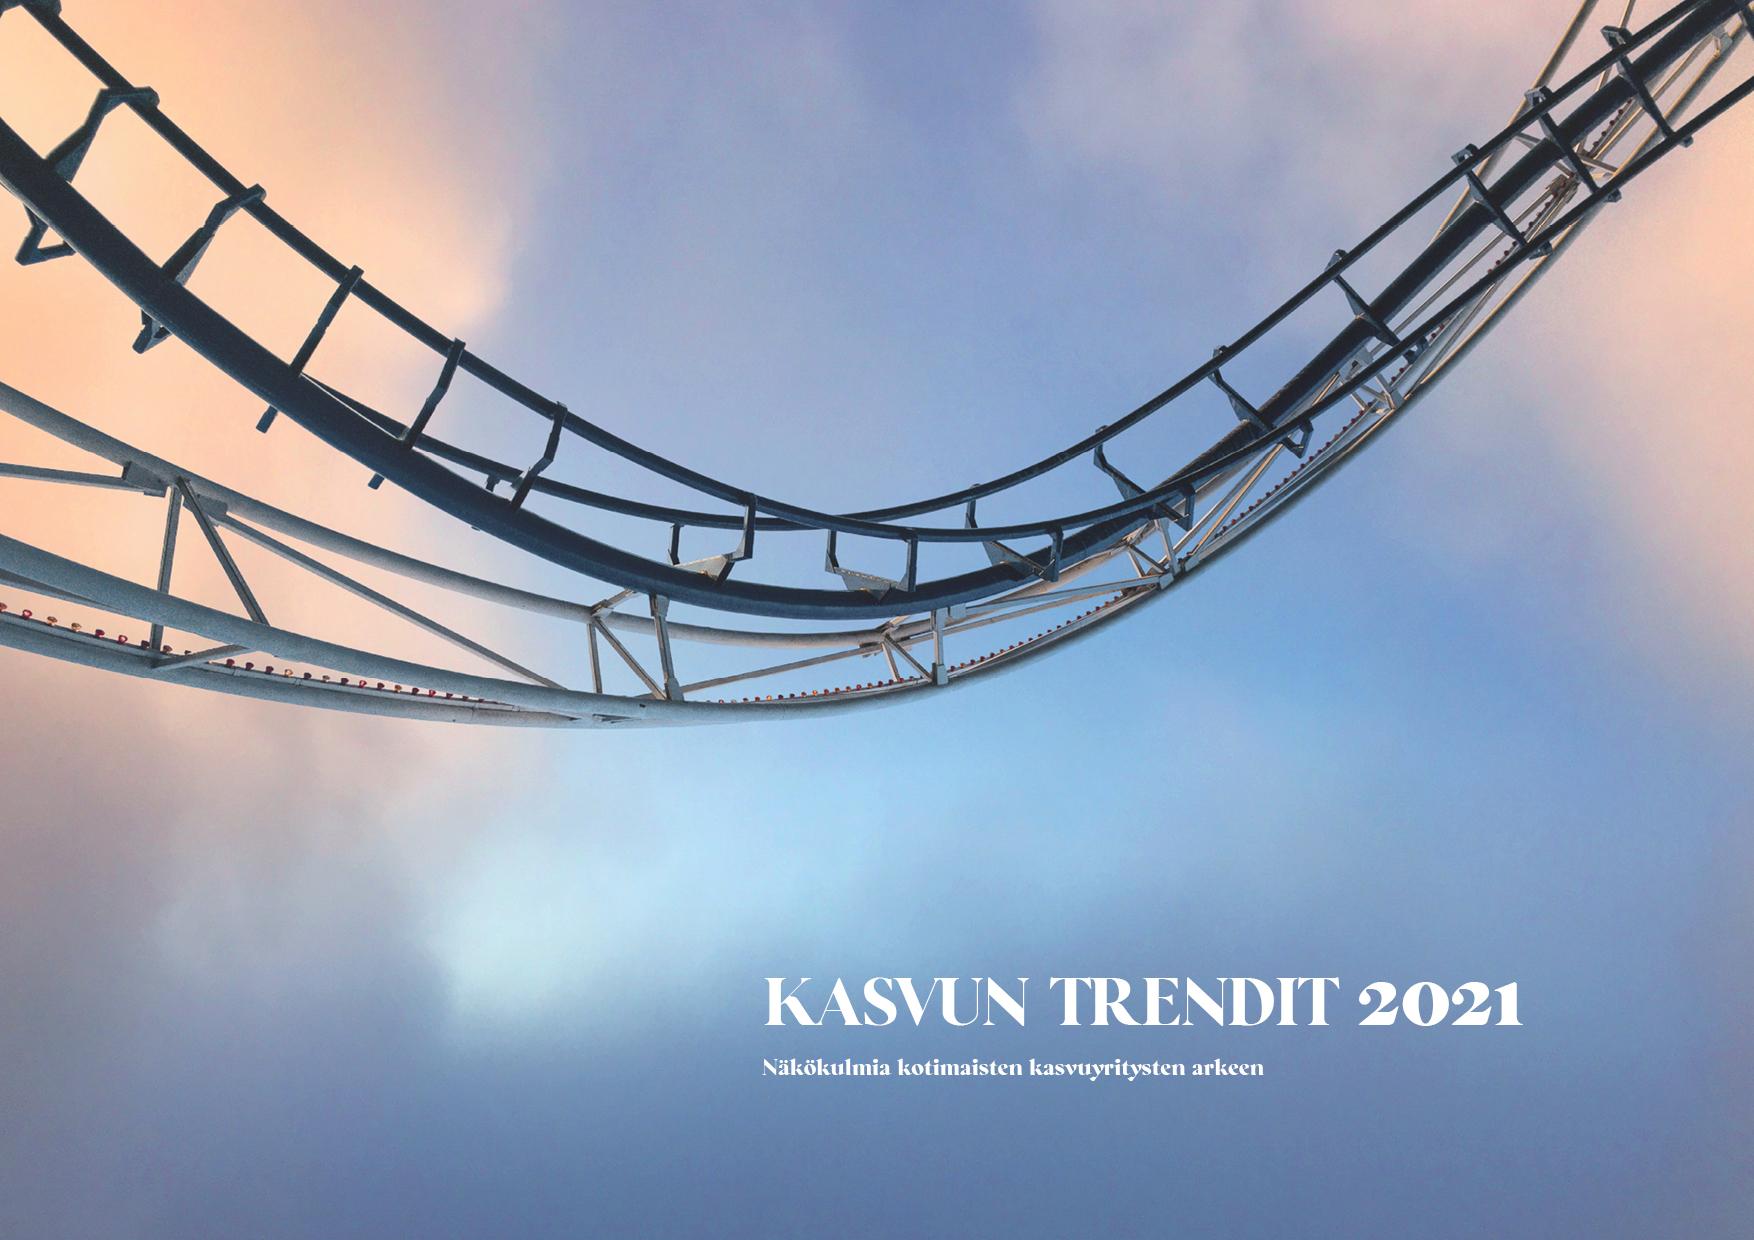 Kasvun-trendit-2021-kansi